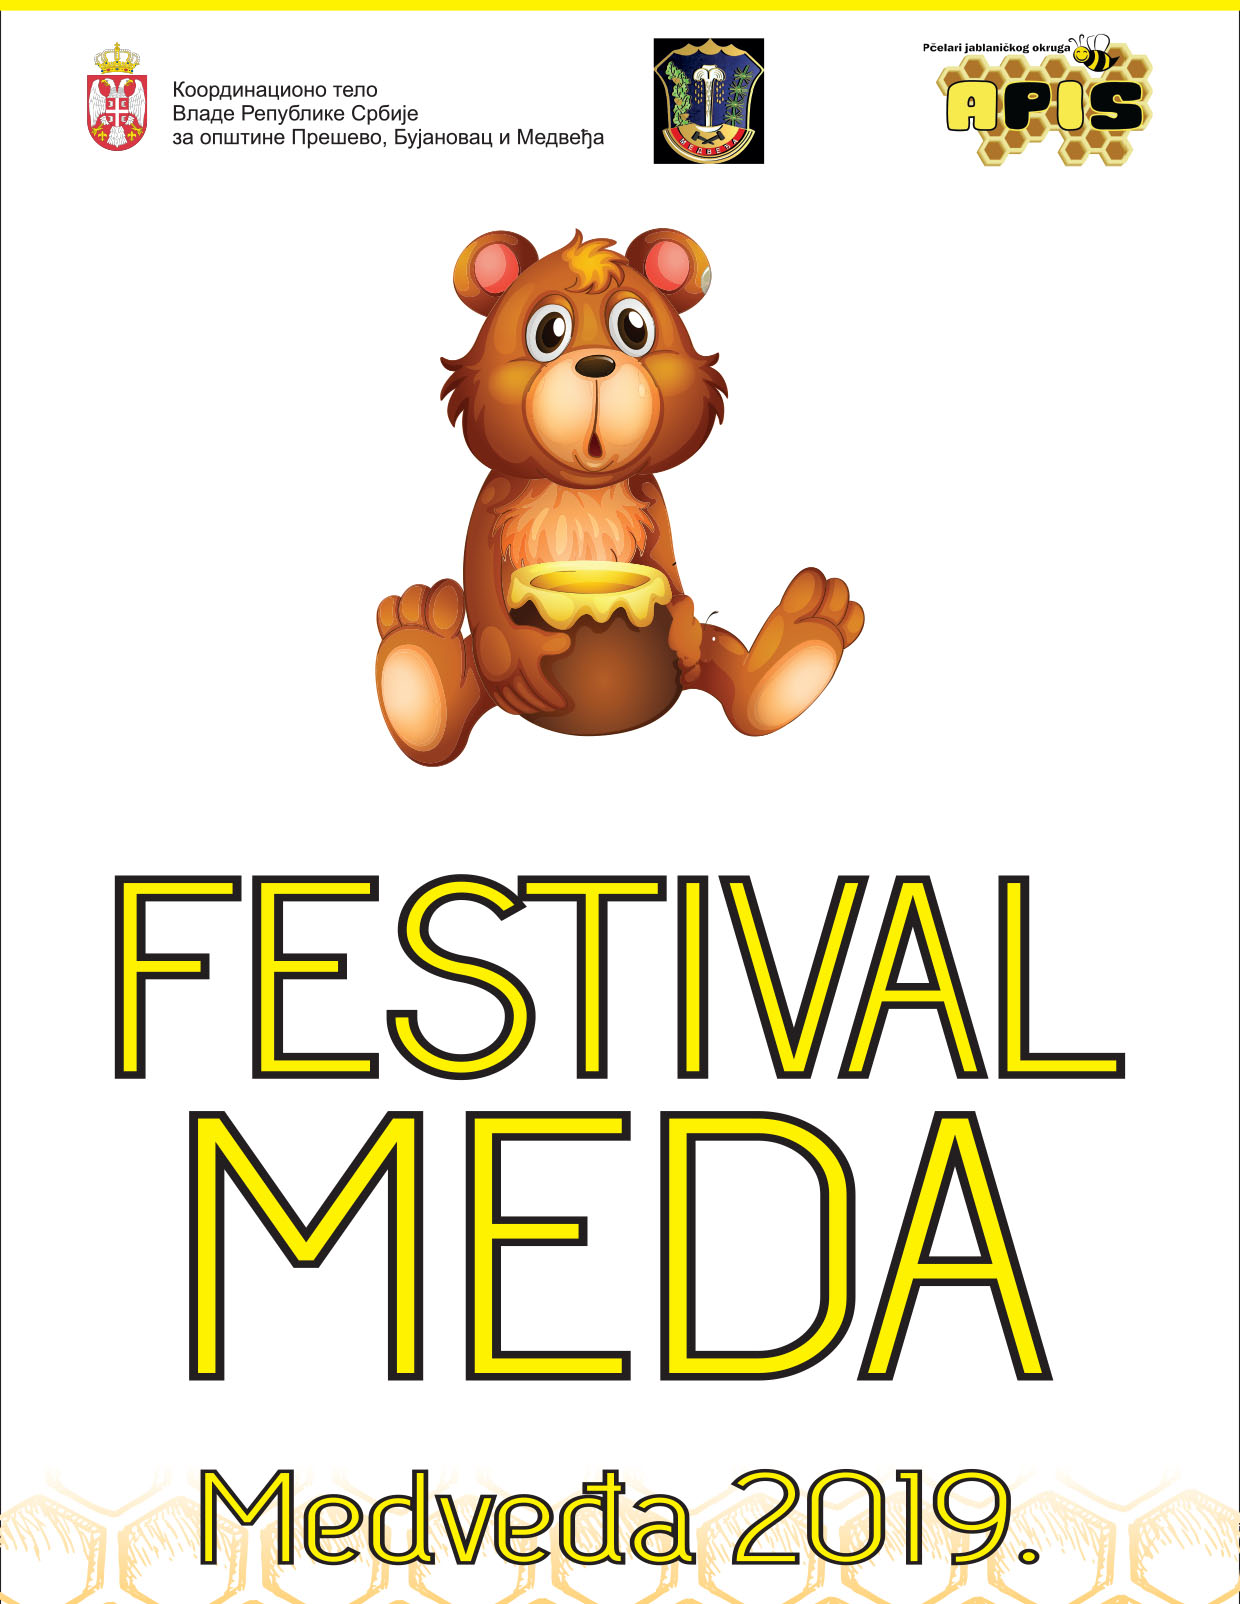 Ilustracija: Festival meda